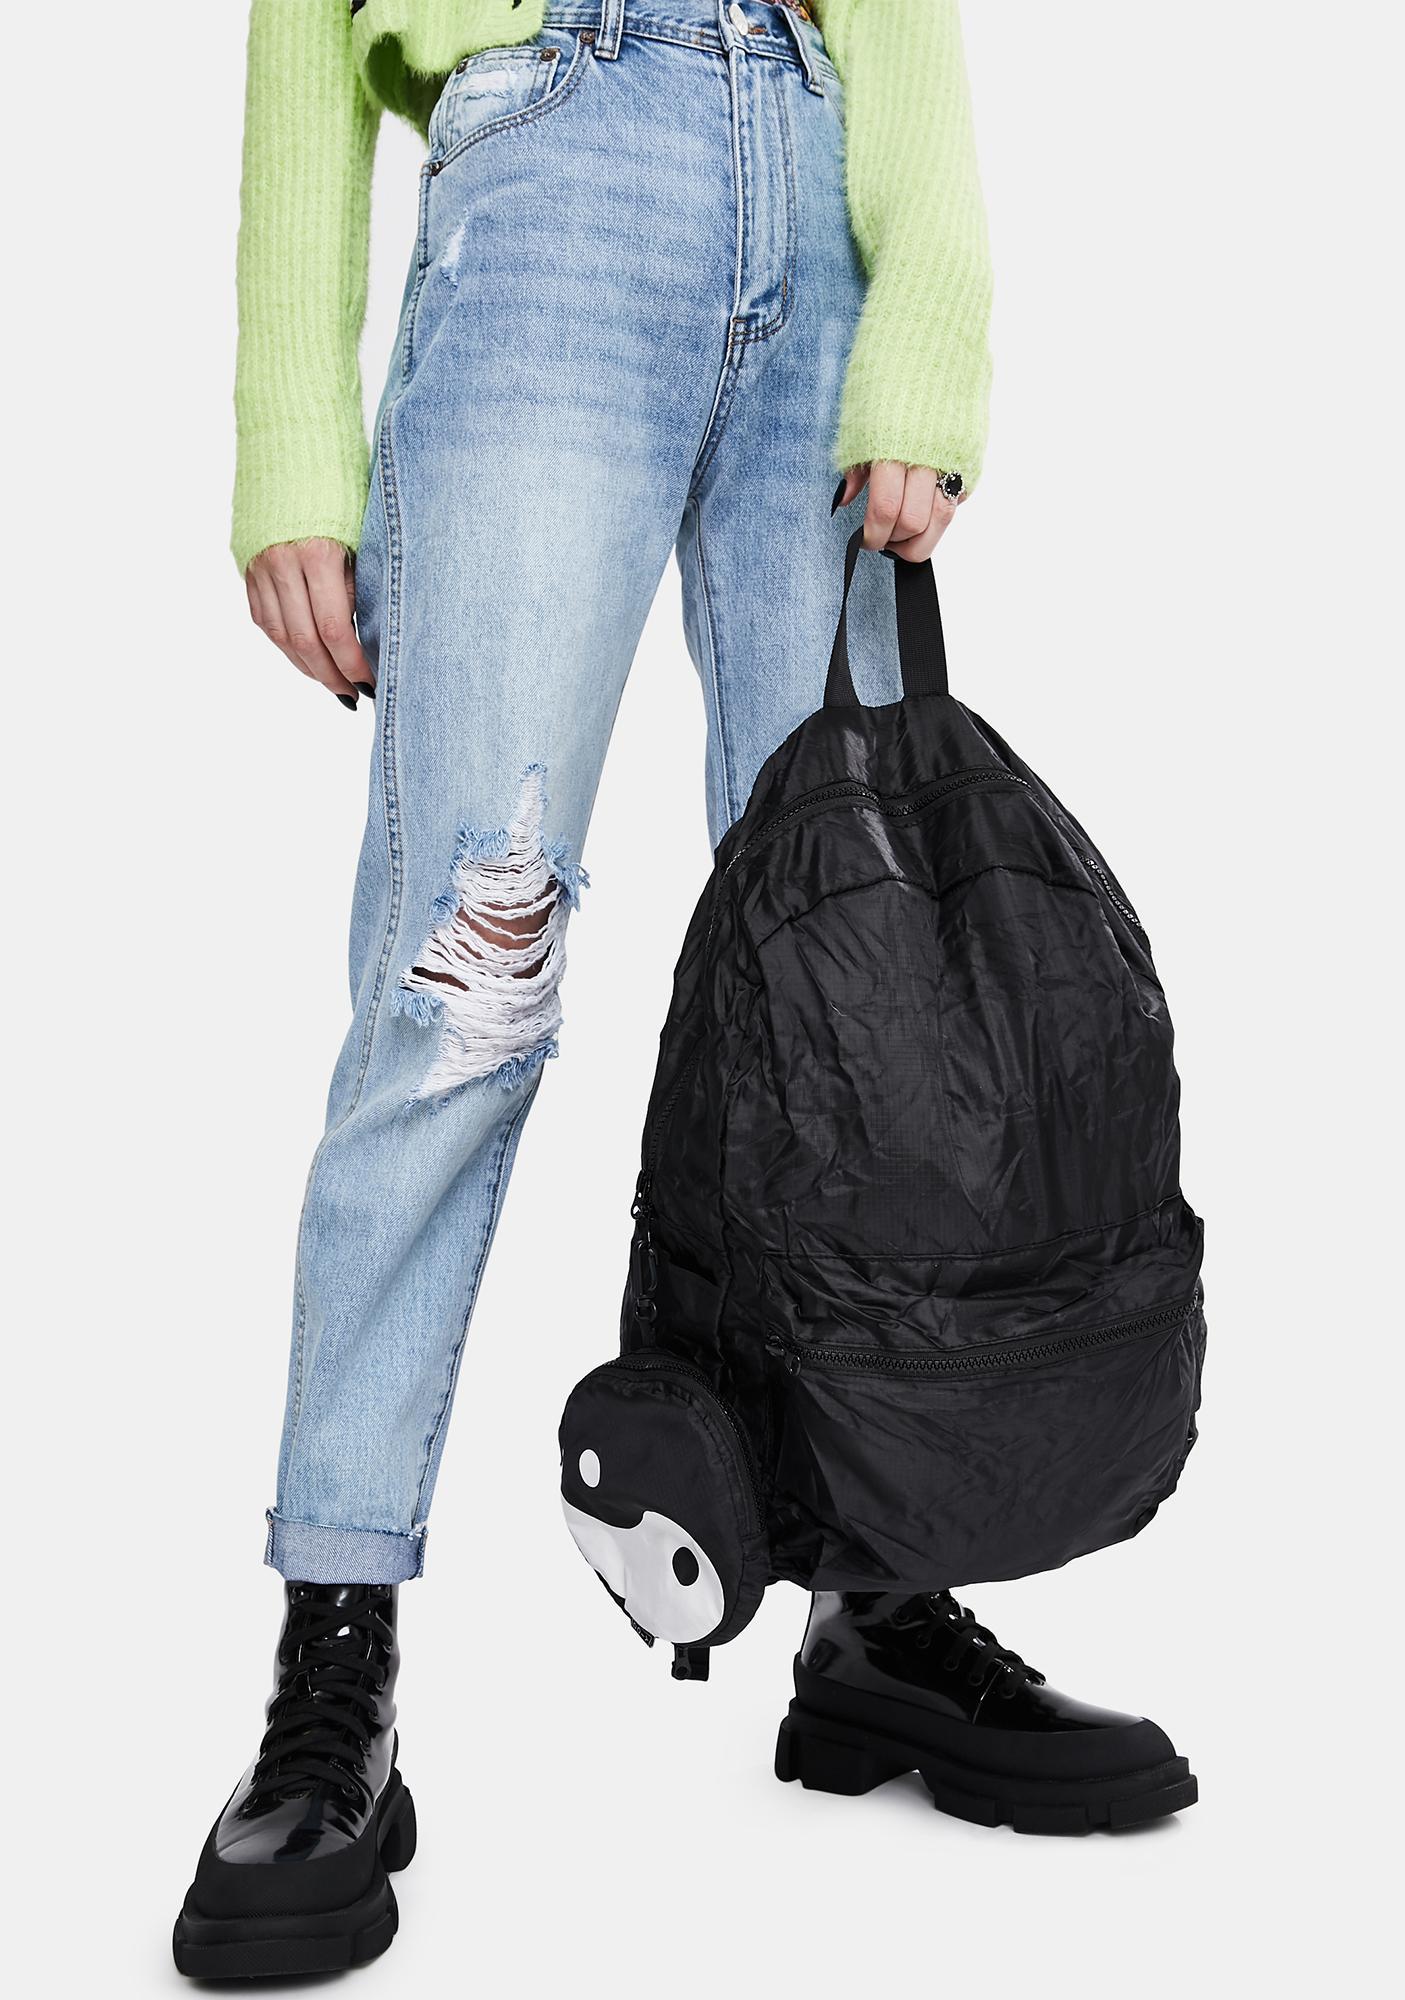 Yin Yang Foldable Backpack